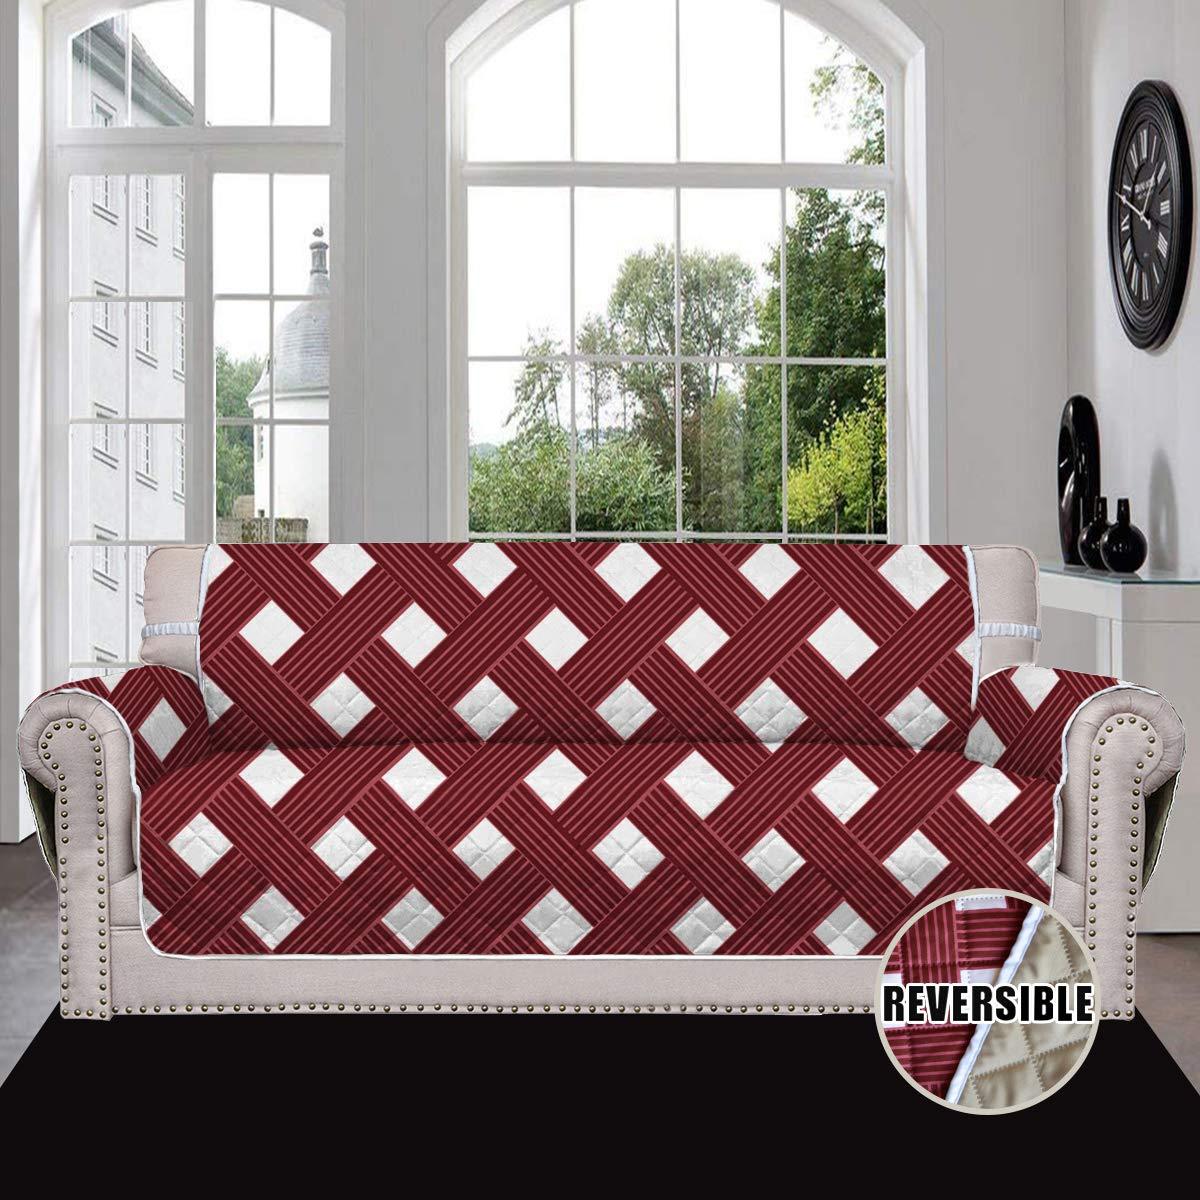 Easy-Going Sofa Slipcover Reversible Sofa Cover Furniture Protector